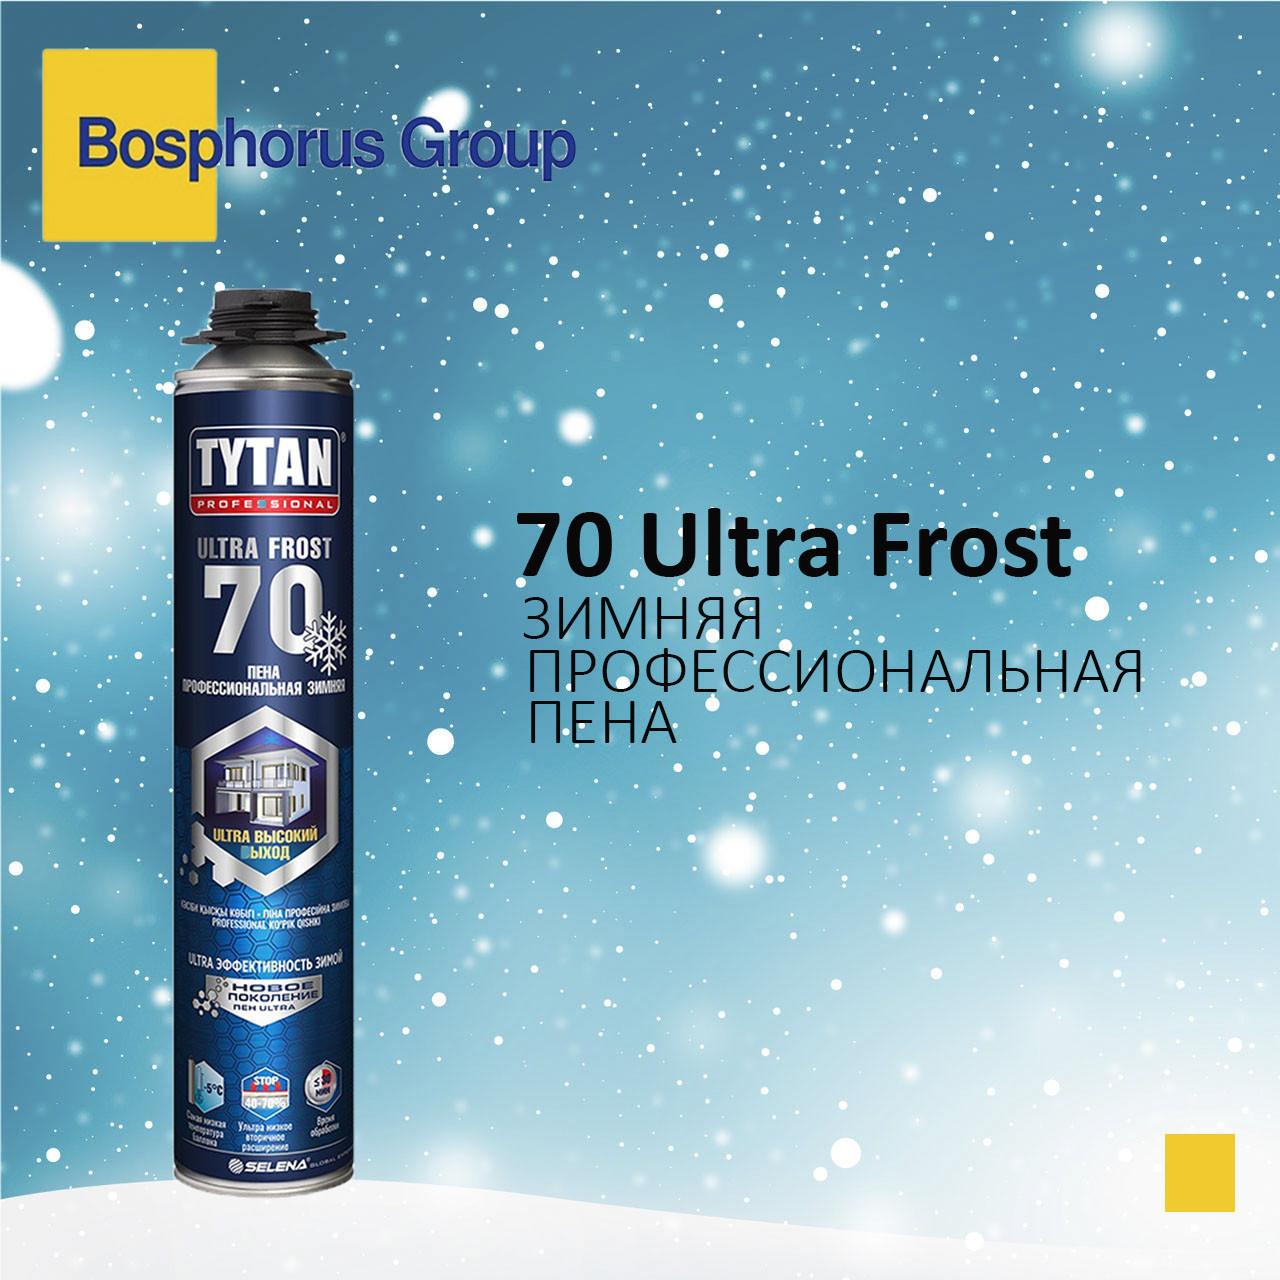 Пена монтажная TYTAN 70 проф зимняя, -20°С